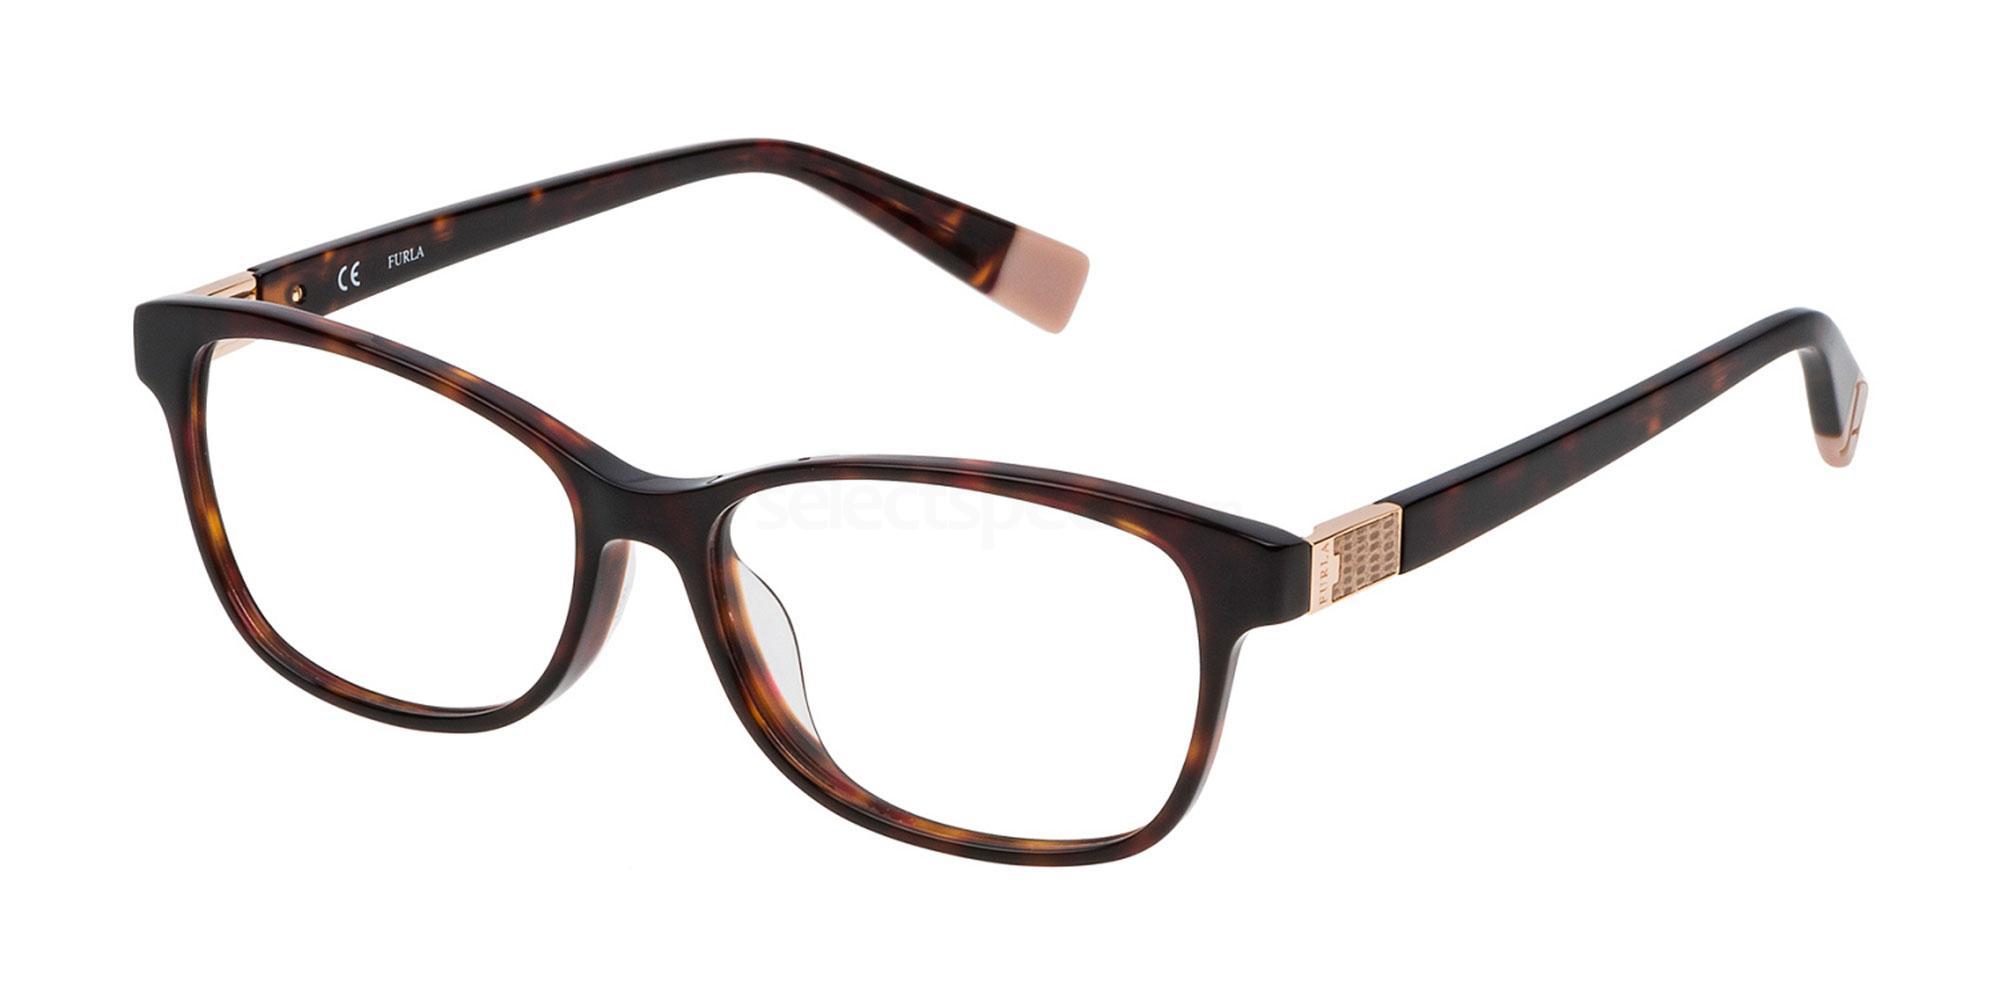 0722 VFU031 Glasses, Furla